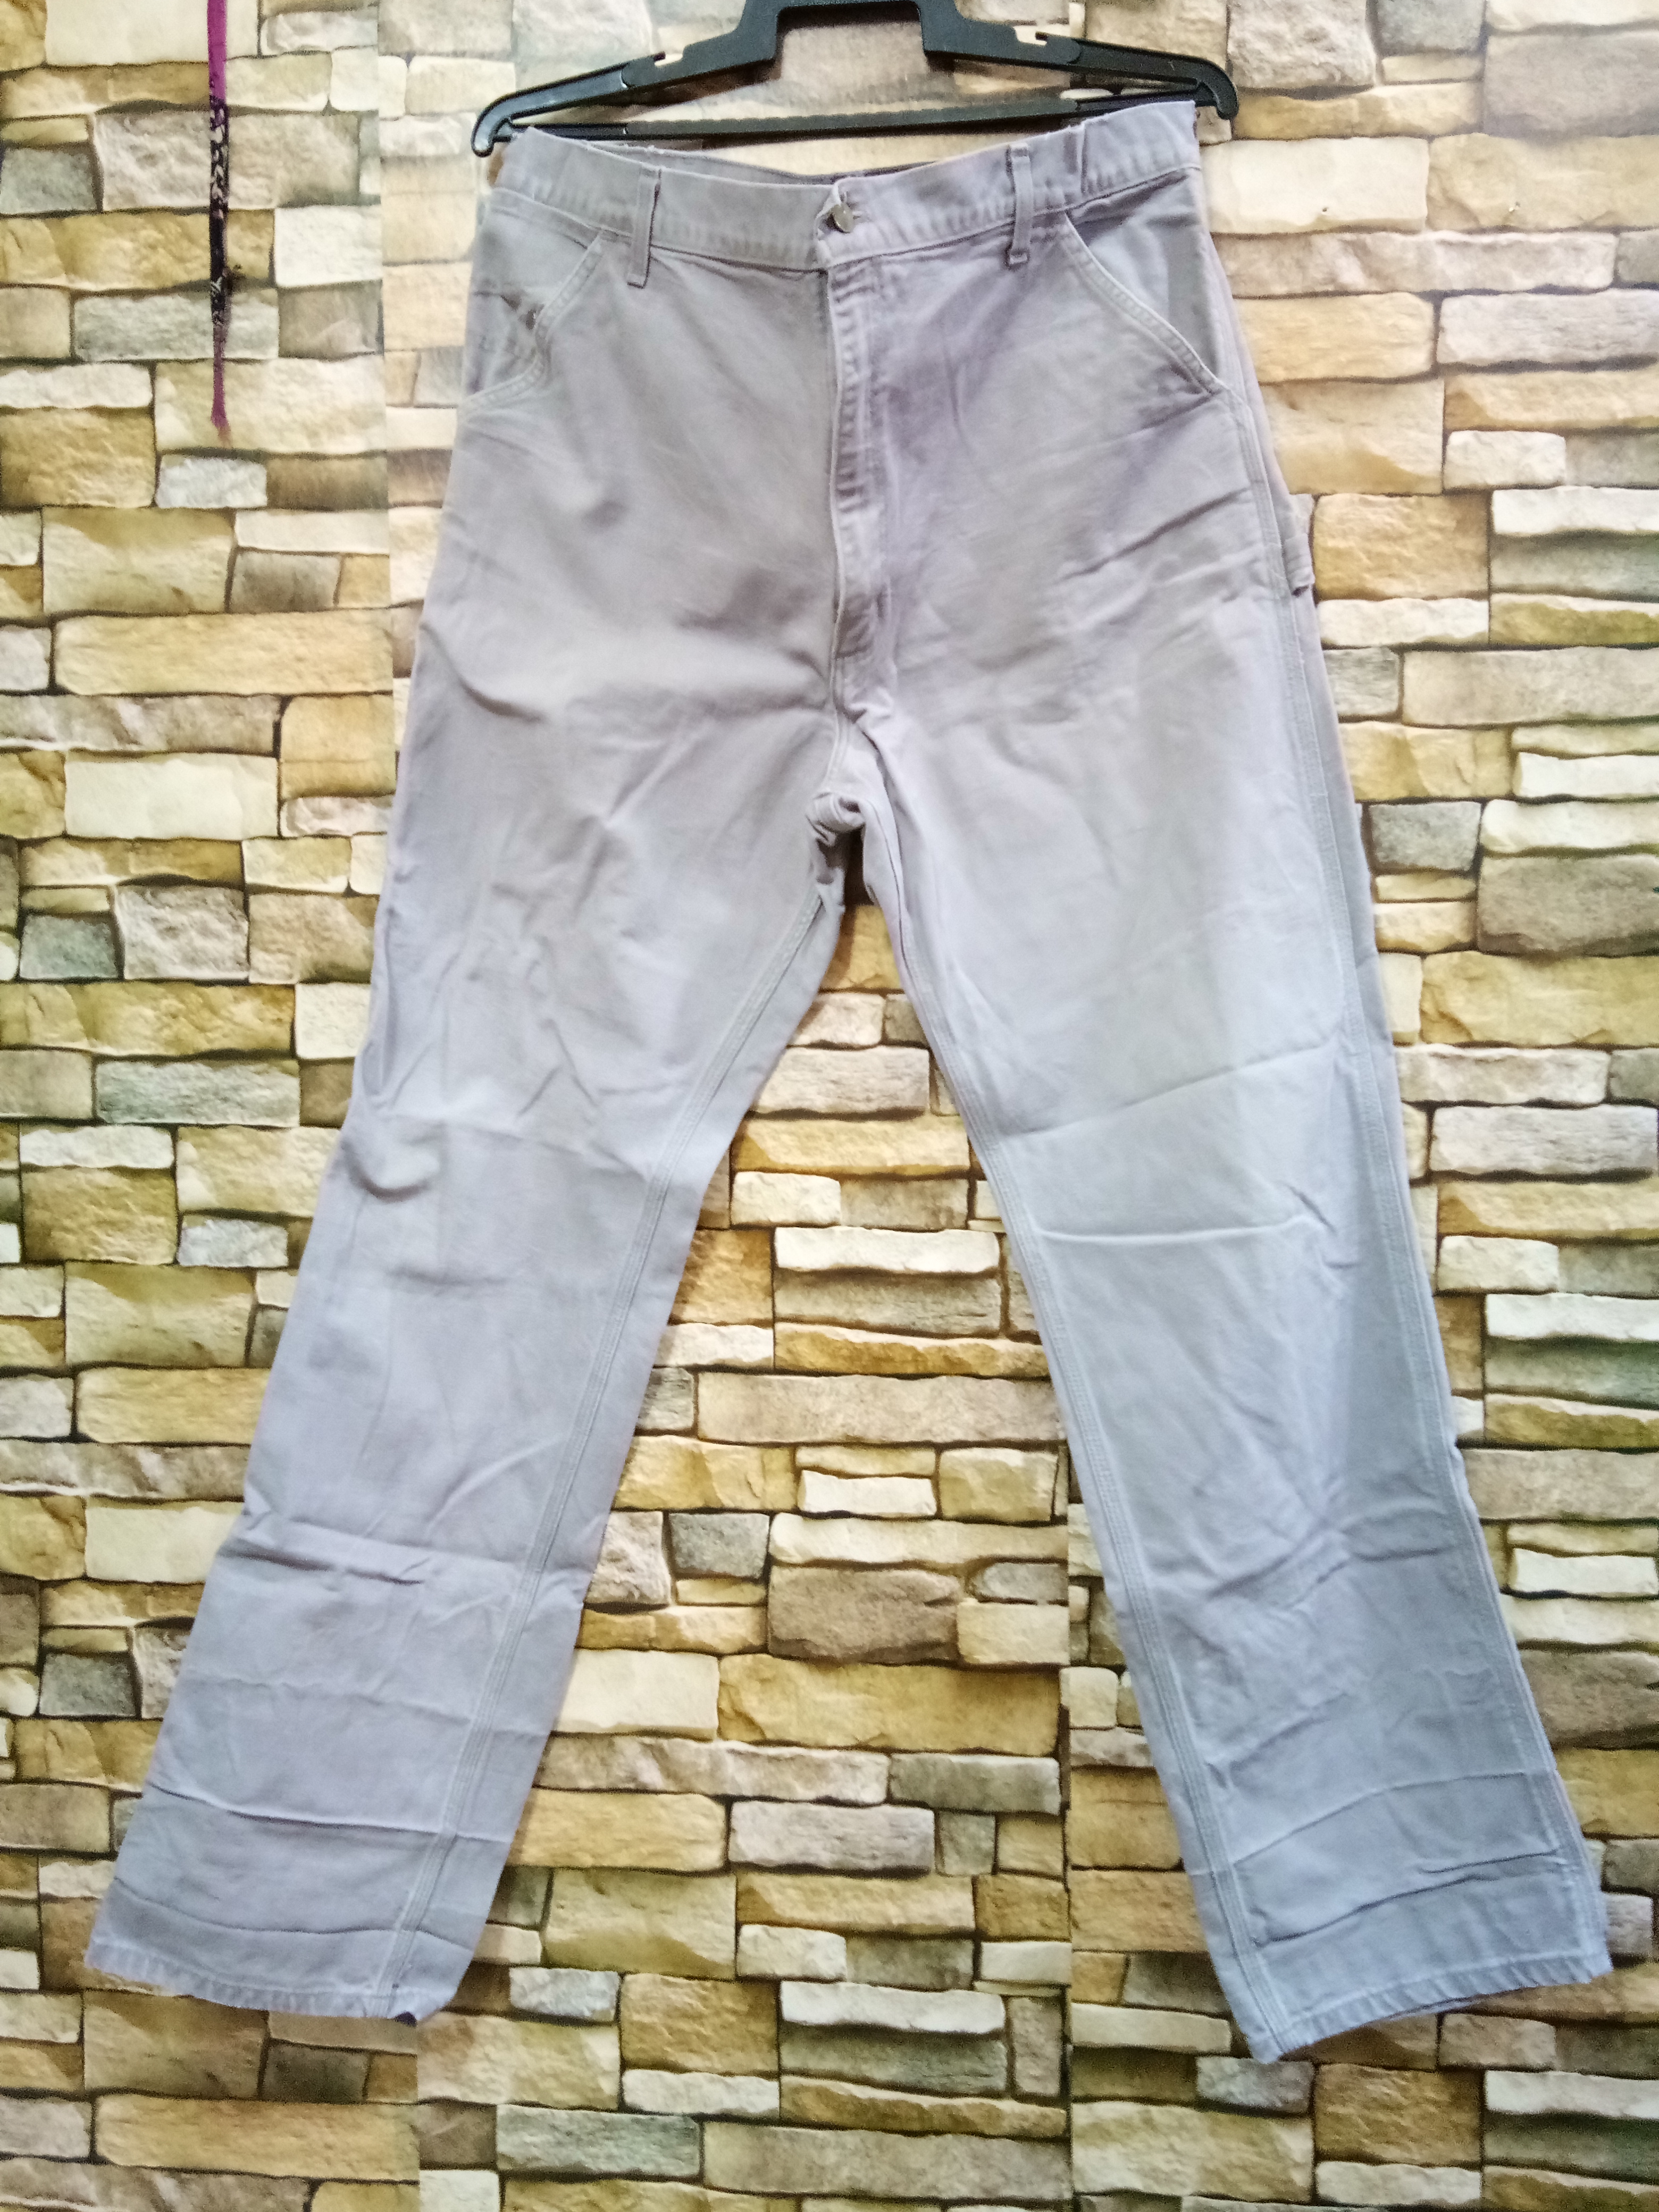 1980s Carhartt Jeans Carpenter Pants Size 32 Union Made USA